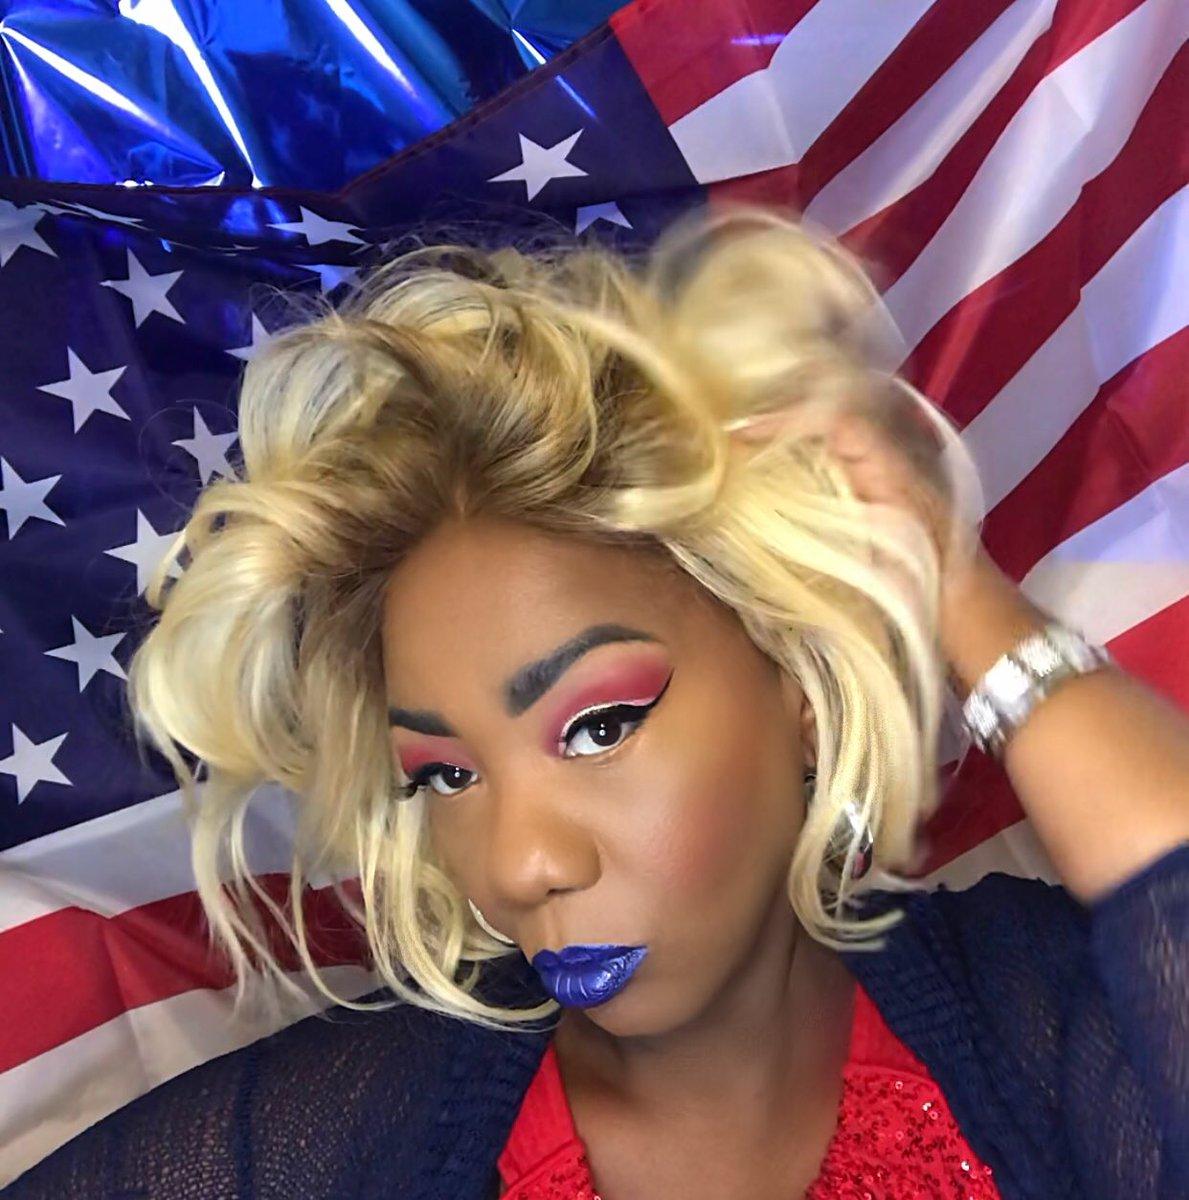 Classic Pin up Girl Makeup - 4th of July Edition  https://youtu.be/_SPp49dxo6A #fentybeauty #makeupvideos #makeuponfleek #prsearch #slayage #beauty #wocmakeup #blackblonde #blackblondegirl #bombshell #blondie #brownbombshell #makeupartist #lipstick #blackgirlmagic #makeupofthedaypic.twitter.com/Ih3DspNiam